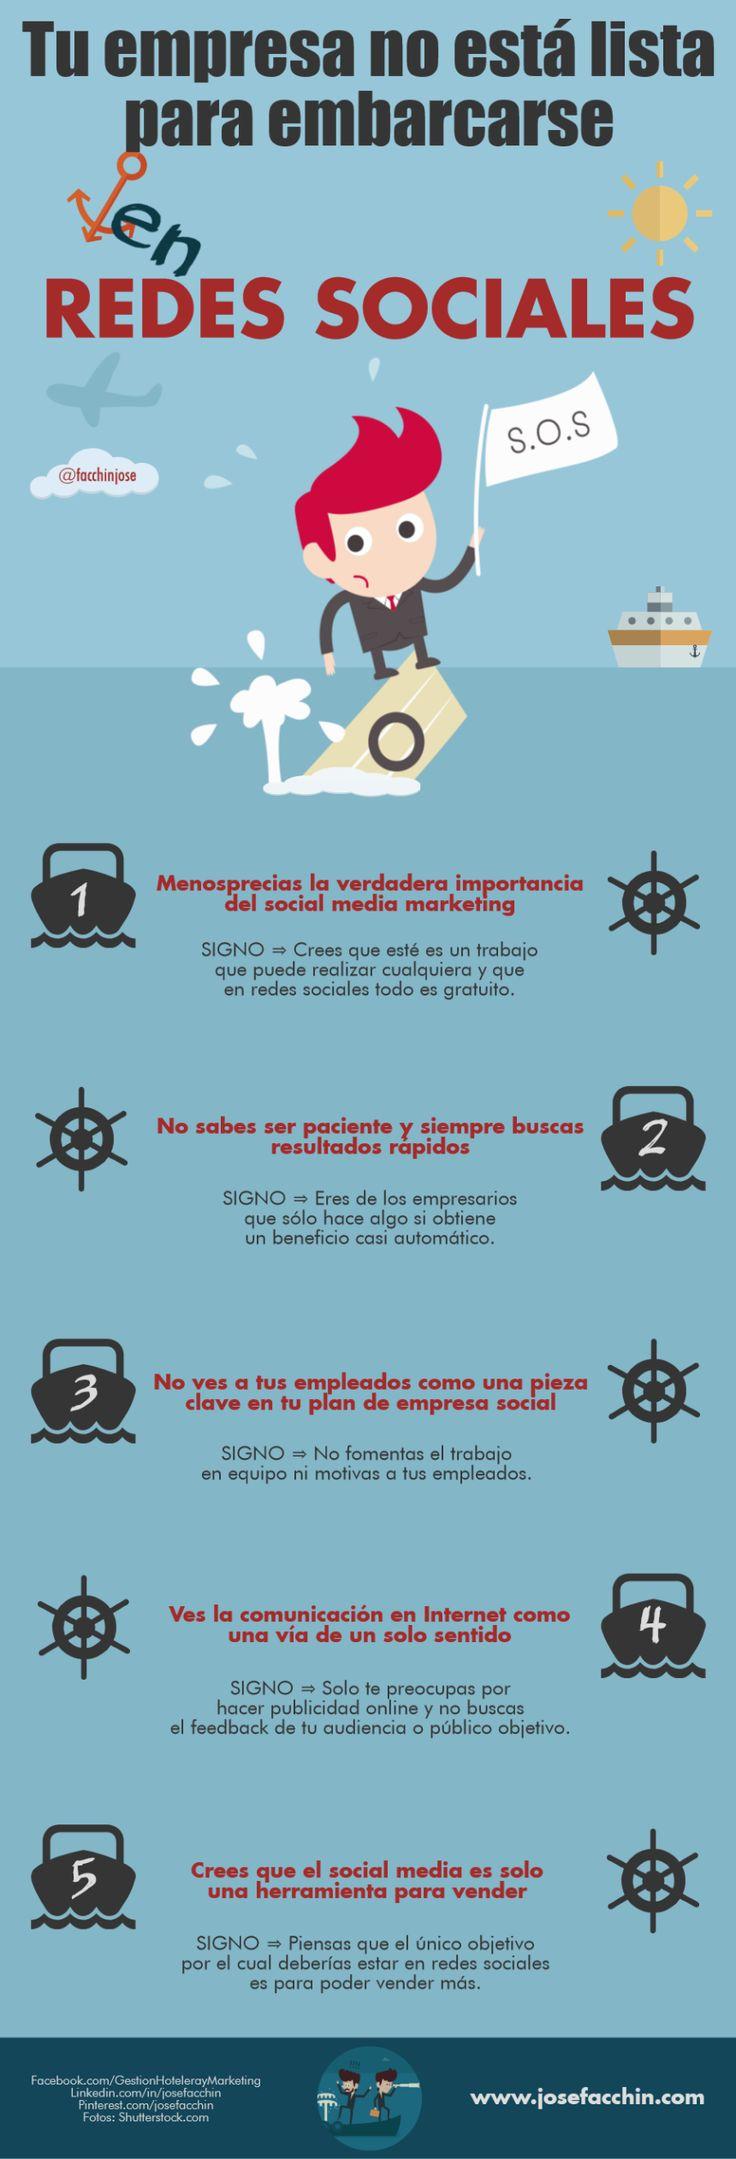 5 síntomas de que tu empresa nos está preparada para Redes Sociales #infografia #socialmedia